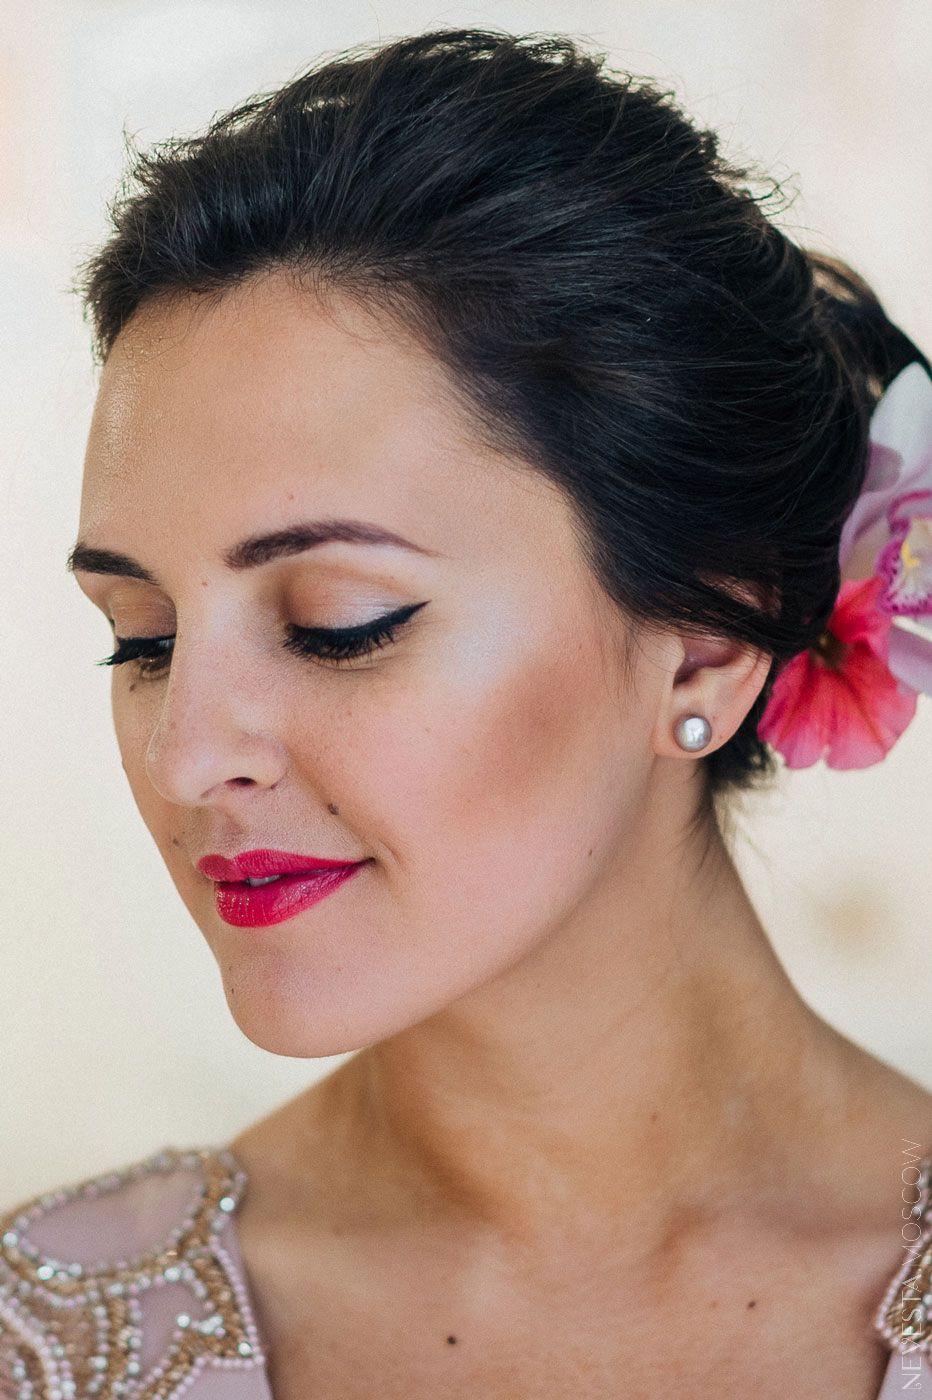 Актриса Мария Шумакова выходит замуж макияж